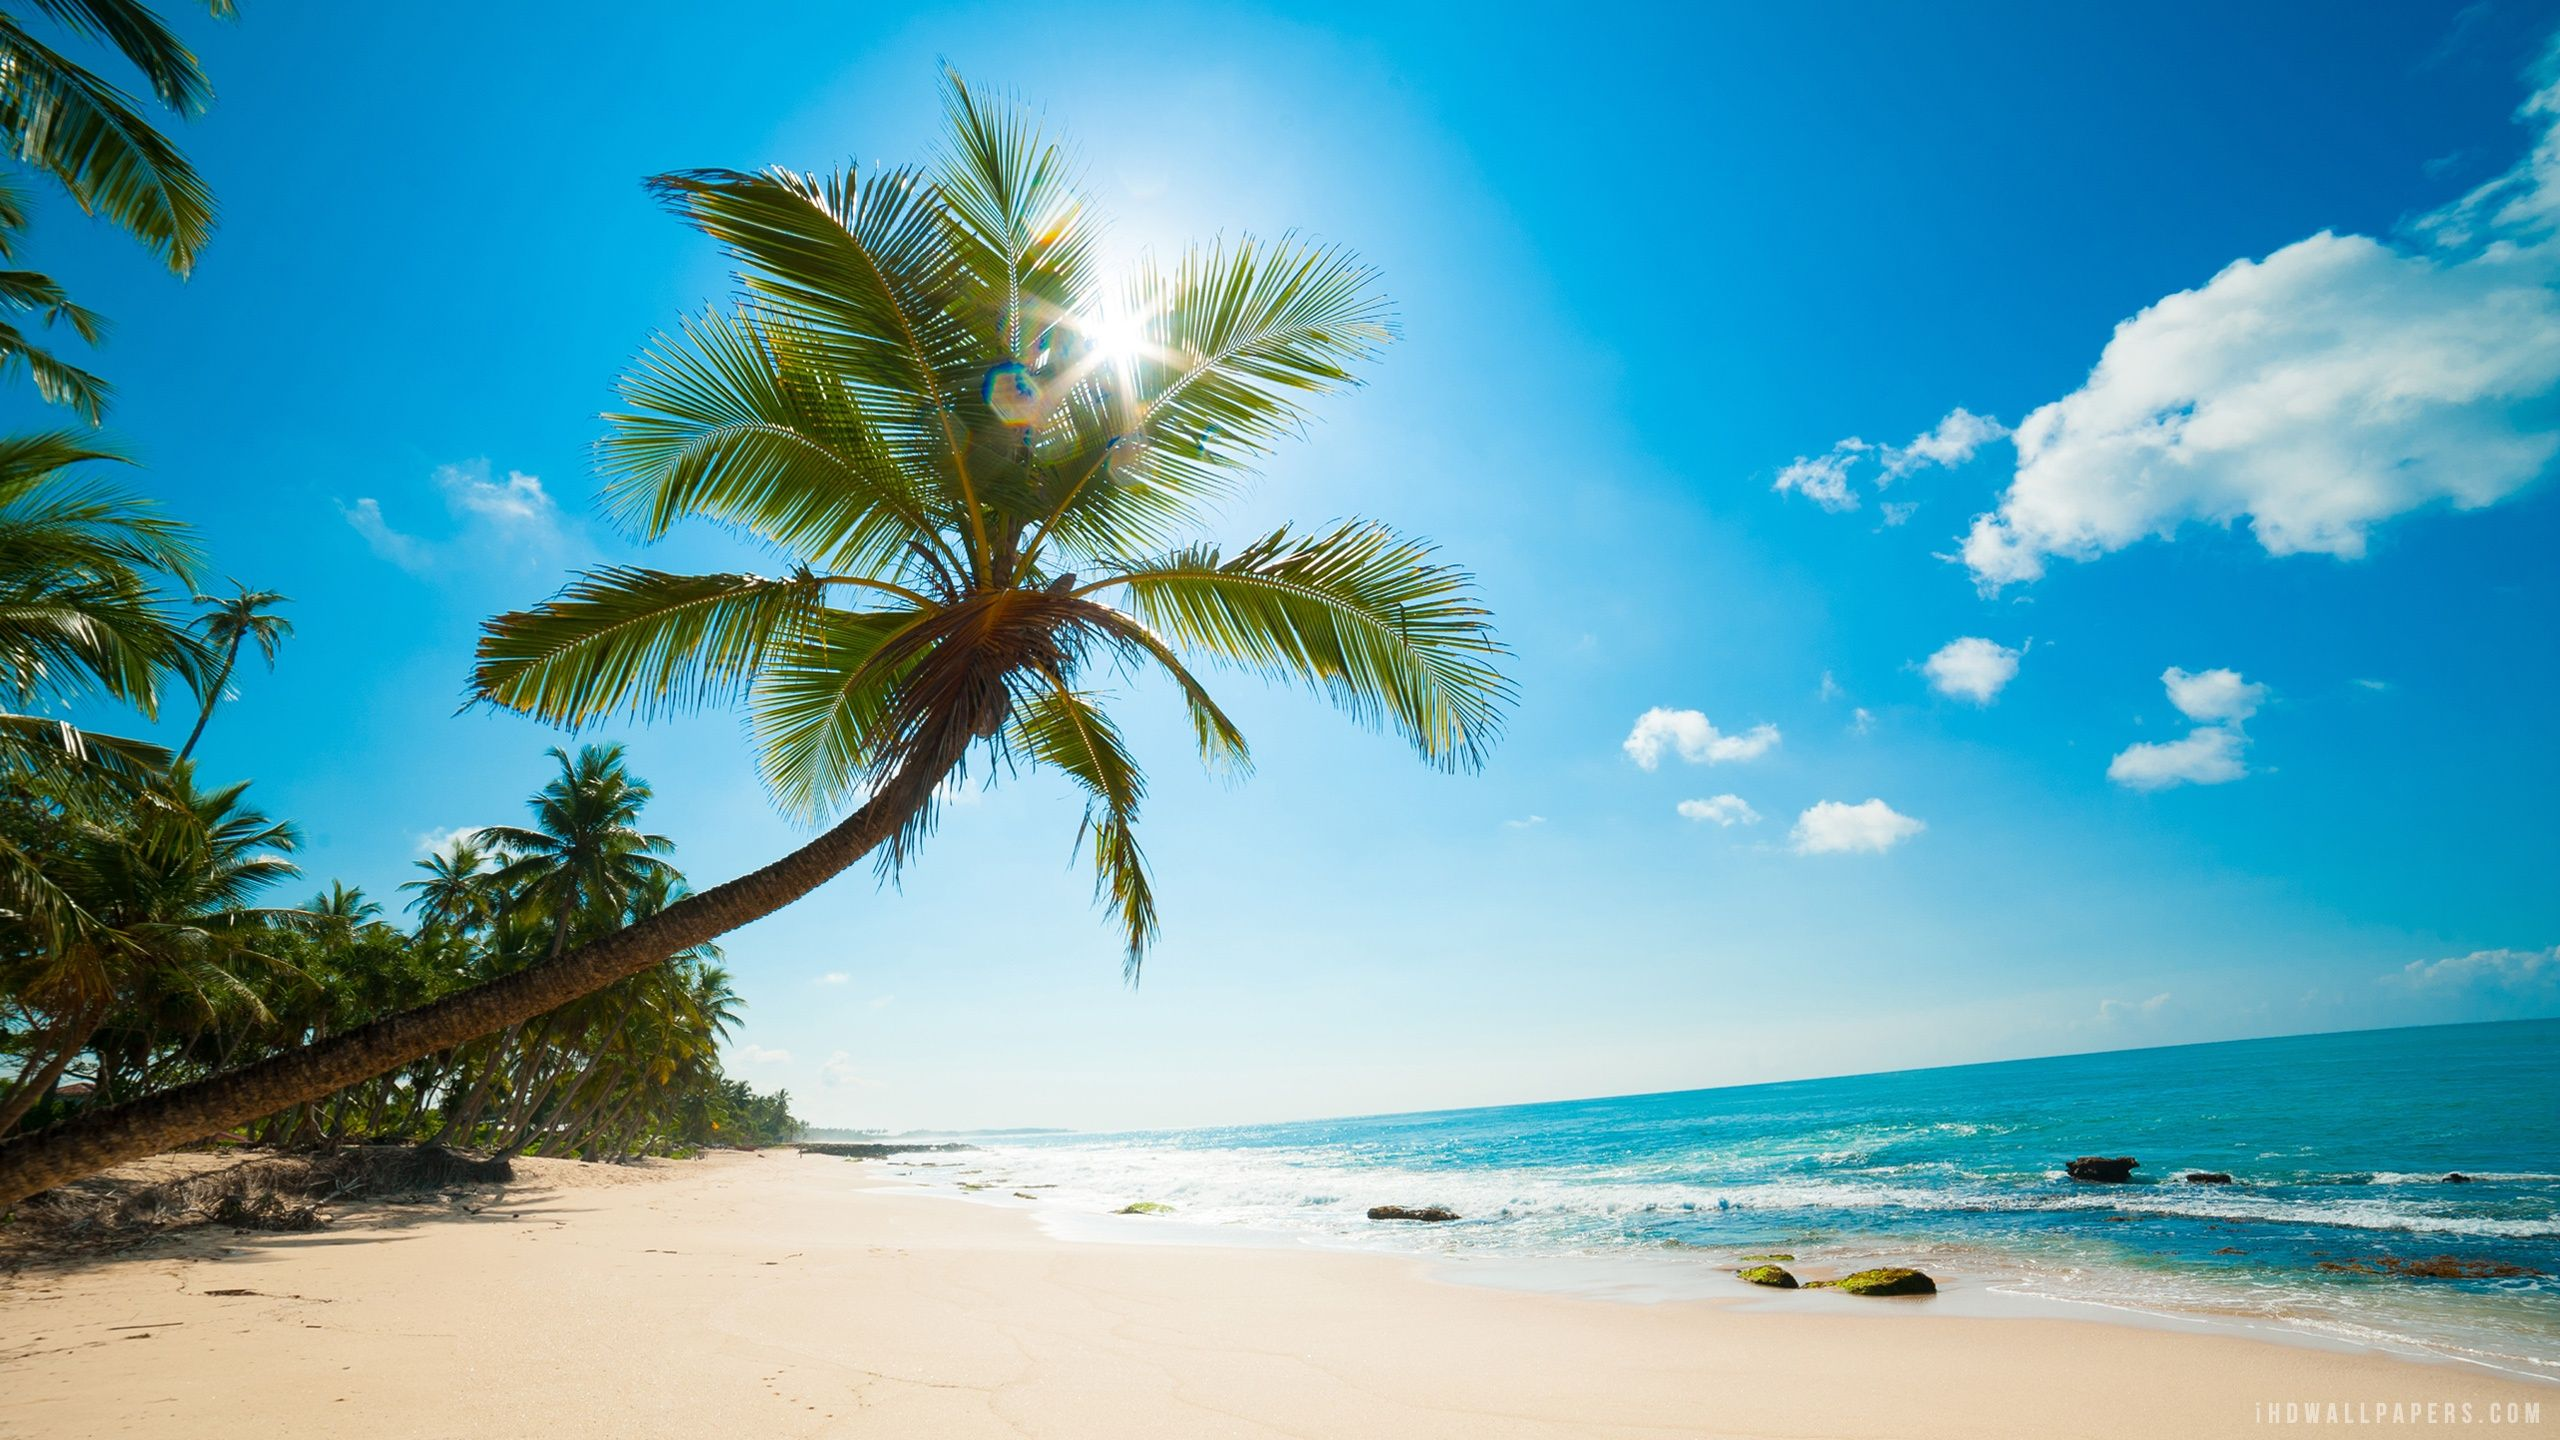 Alquiler de yates en el Mar Caribe. Alquiler de yates en Caribe. Yates de alquiler en el Caribe